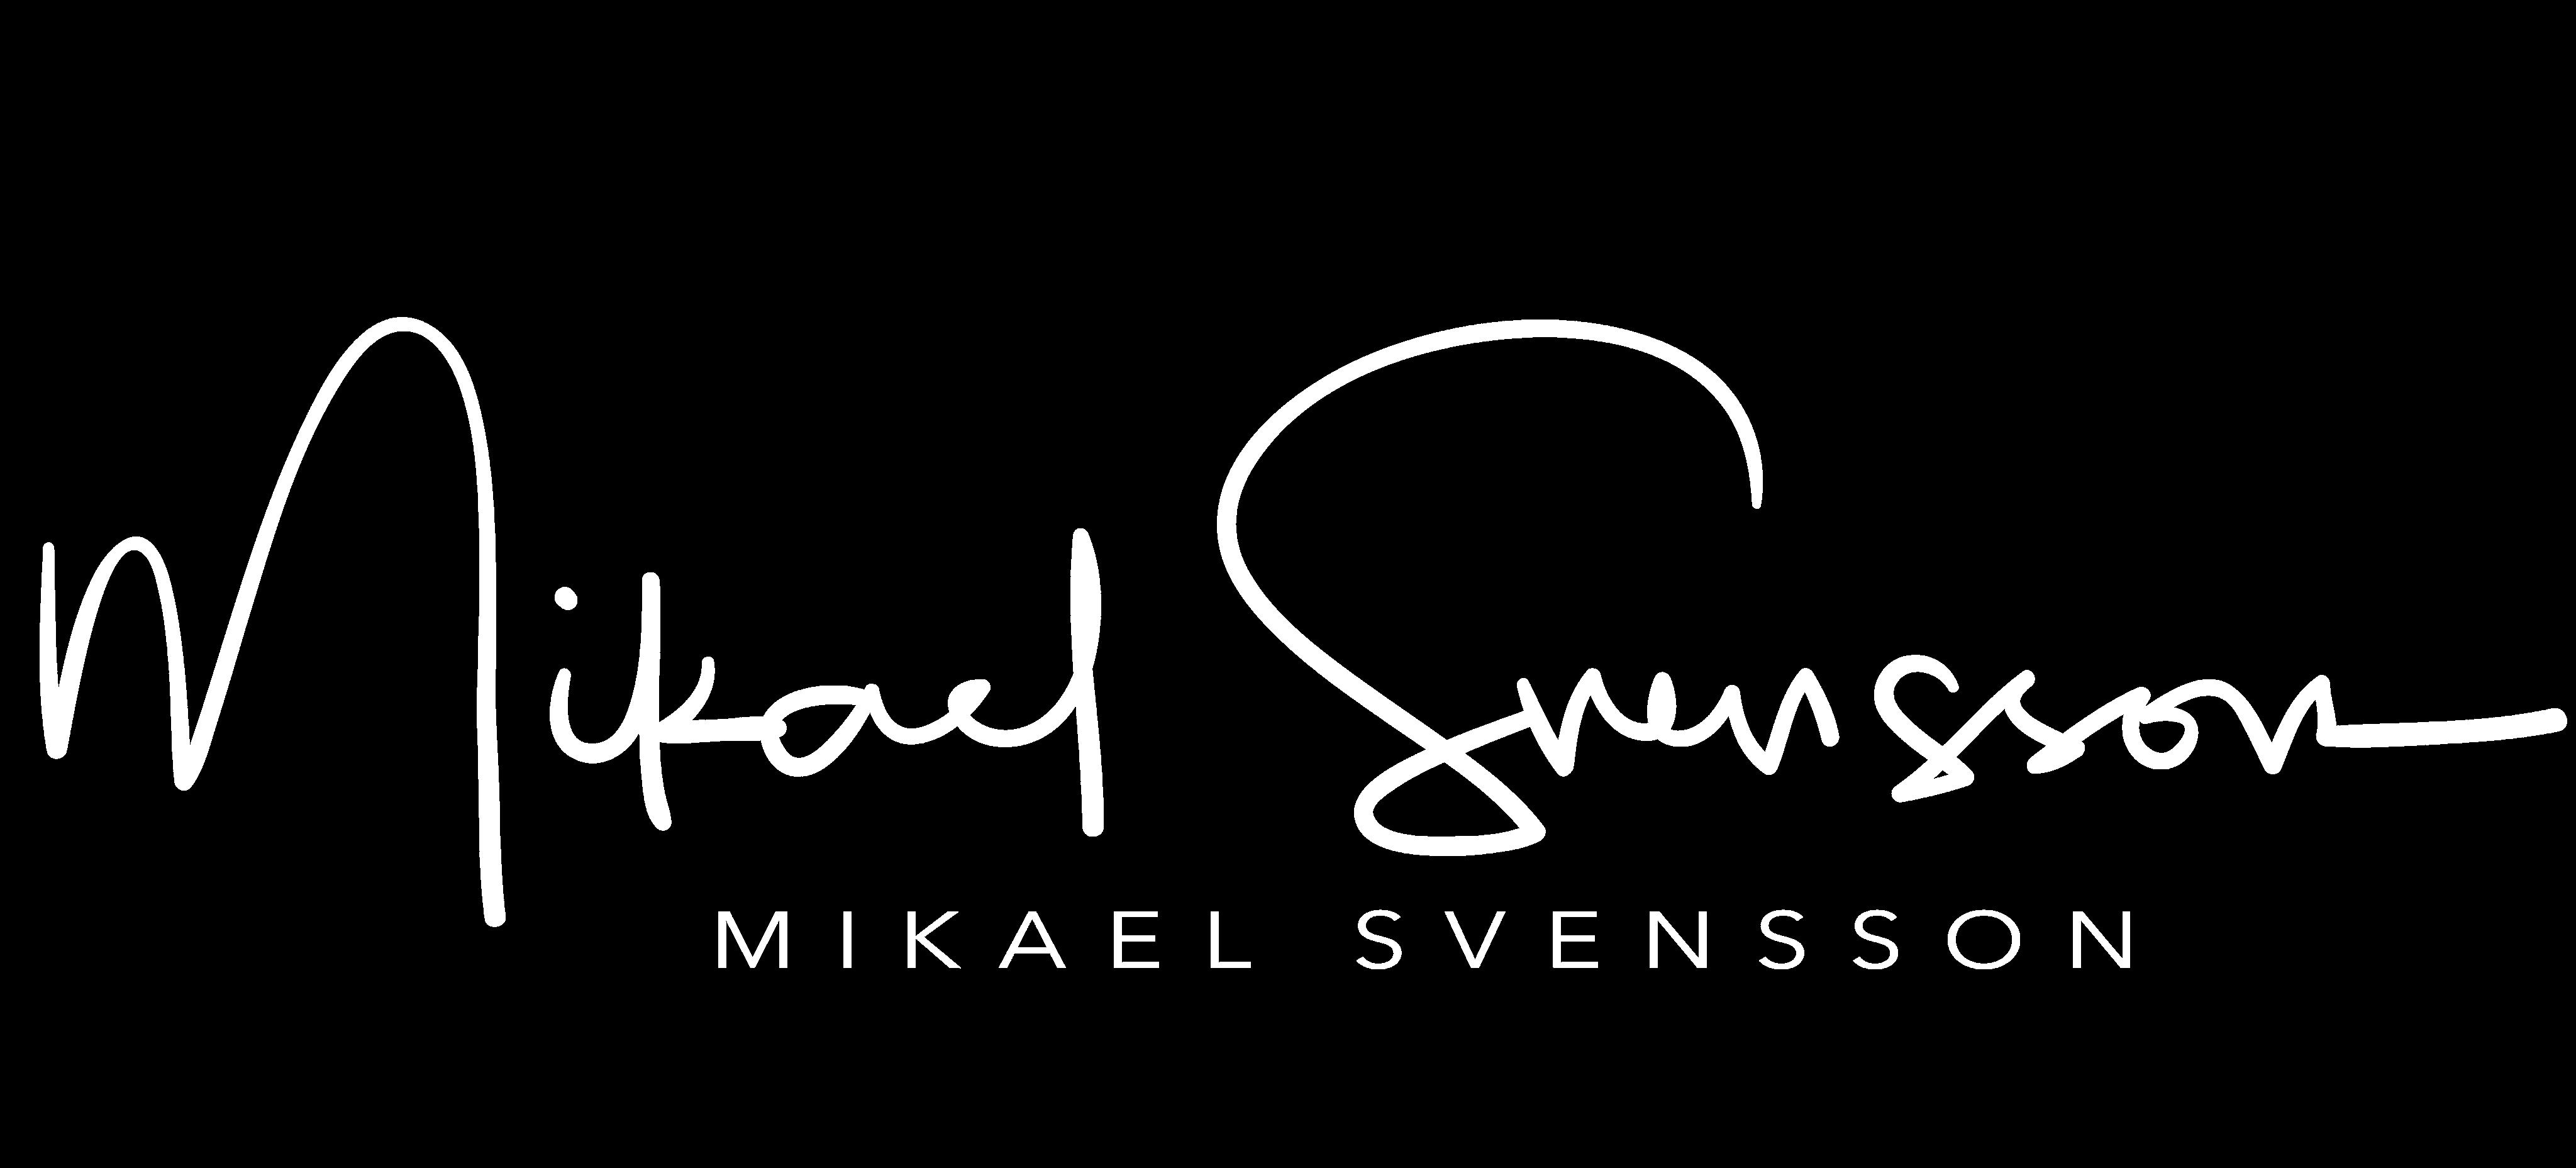 Fotograf Mikael Svensson